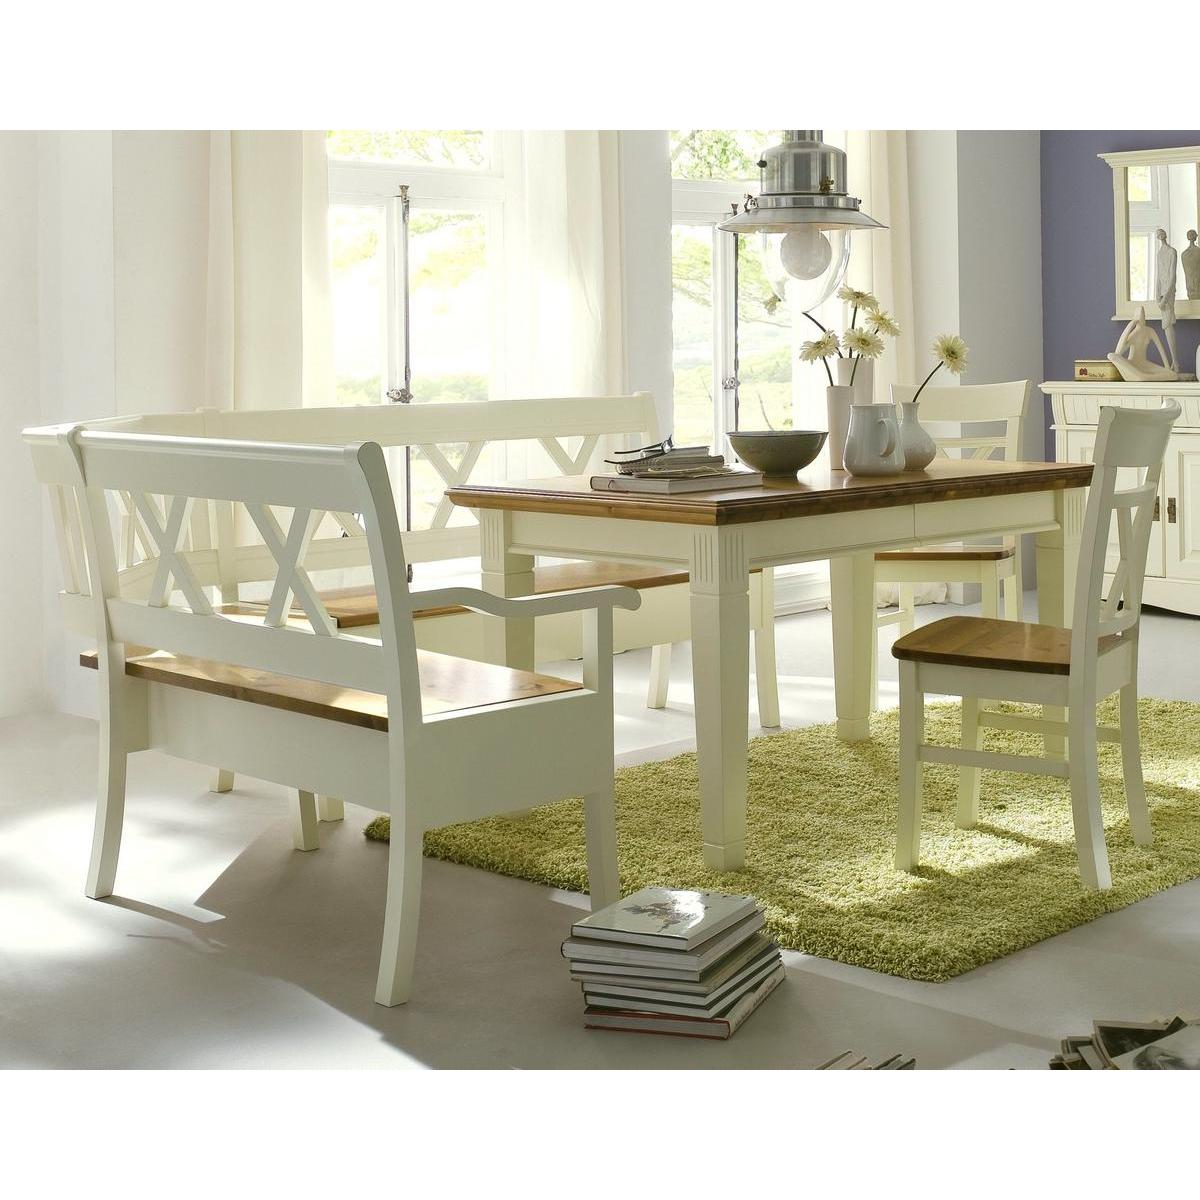 massivholz esszimmer komplett 4 teilig paris mit eckbank 2 farbig champagner goldbraun lackiert. Black Bedroom Furniture Sets. Home Design Ideas